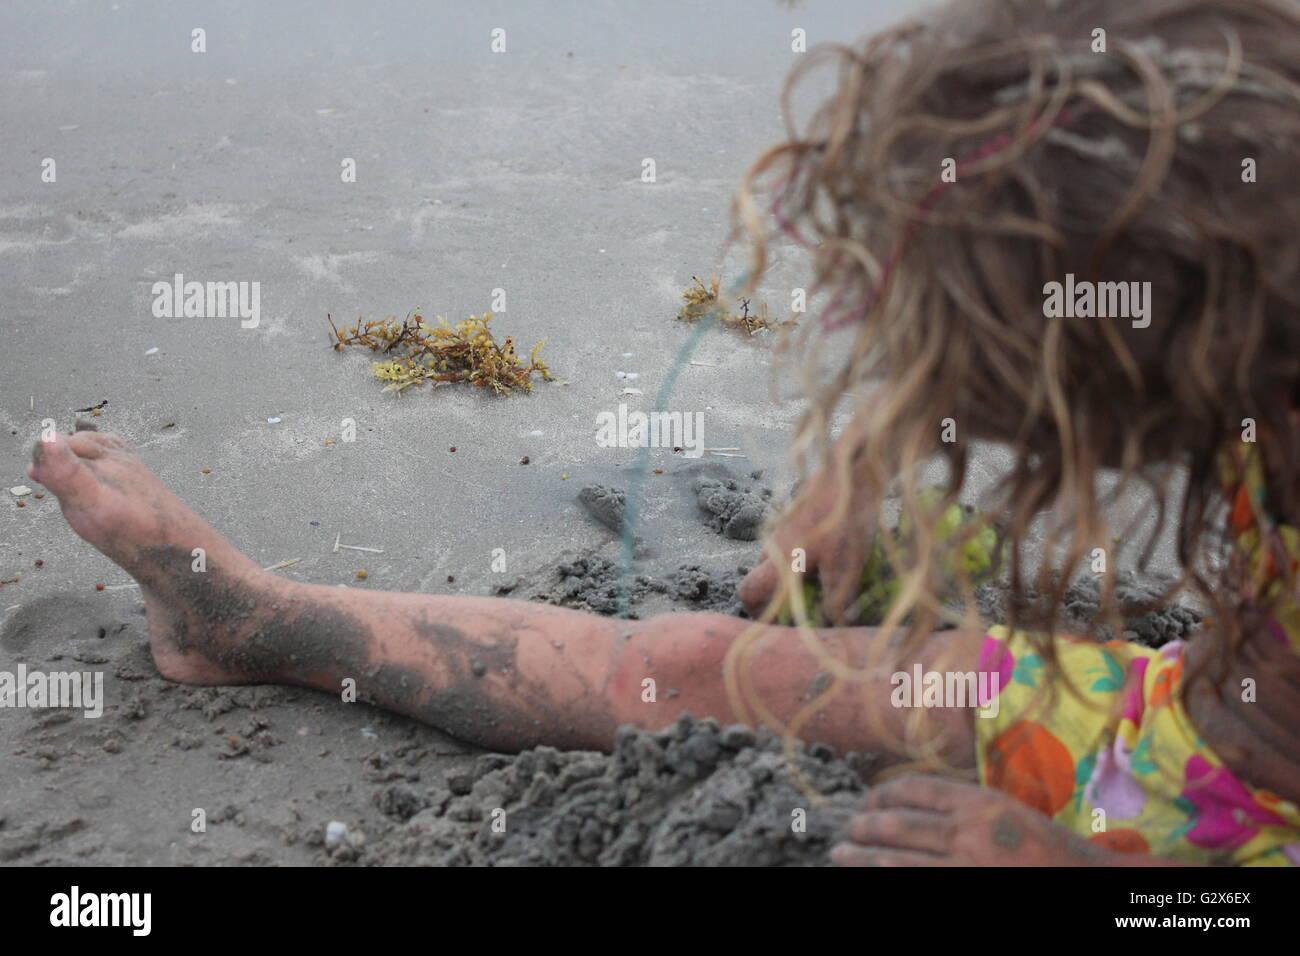 Little Girl Building Castles in the Sand - Stock Image